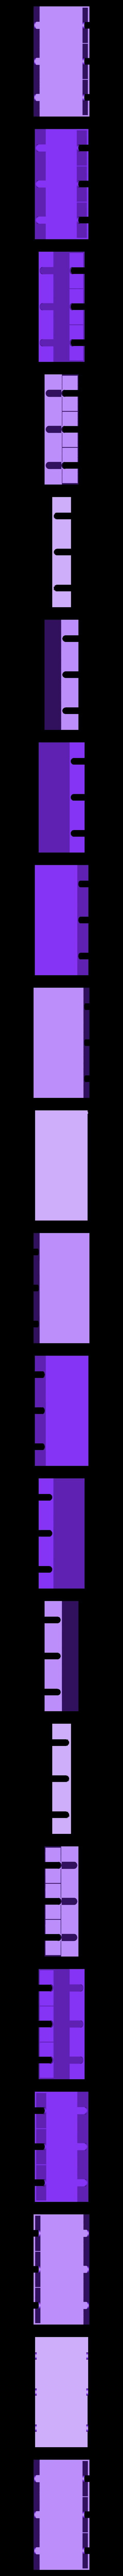 Room_Spell_Discard.stl Télécharger fichier STL gratuit Boss Monster Dungeon Board & Card Holders • Plan pour impression 3D, jbrum360